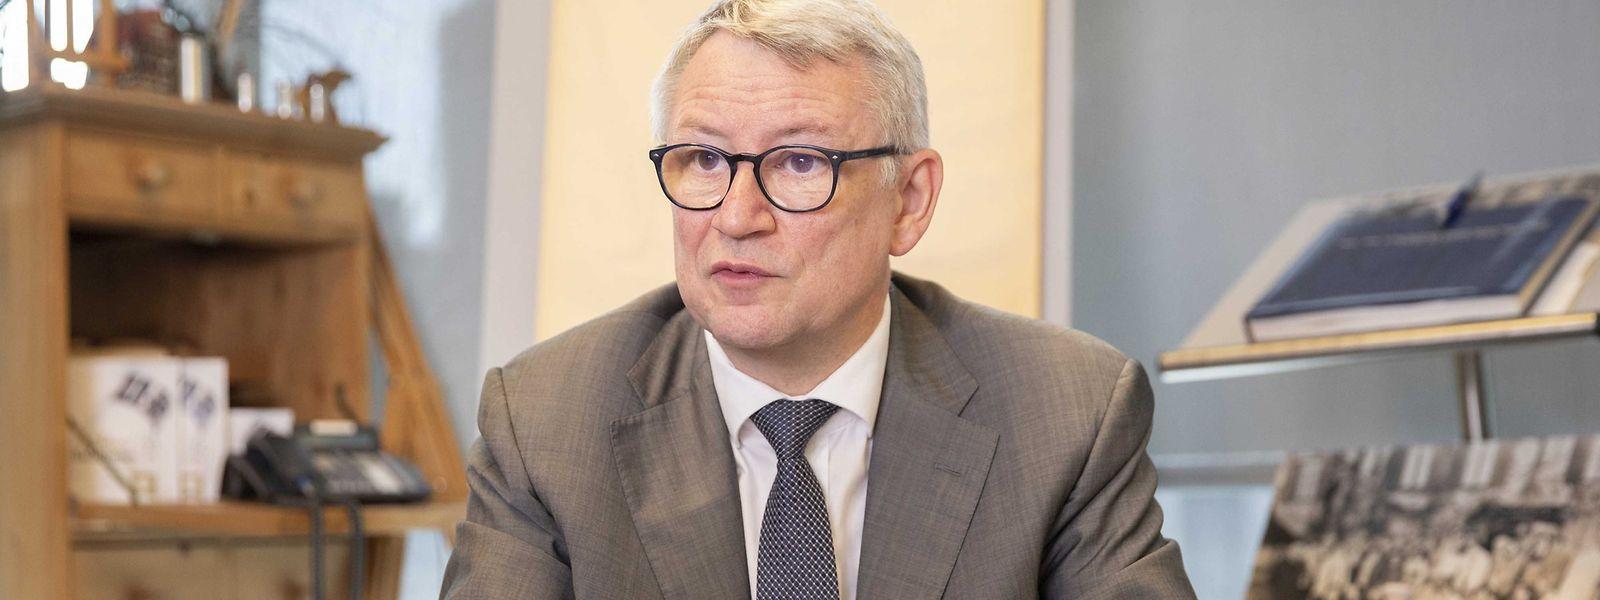 François Koepp hat am 1. Dezember 2012 den Generalsekretär-Posten übernommen.